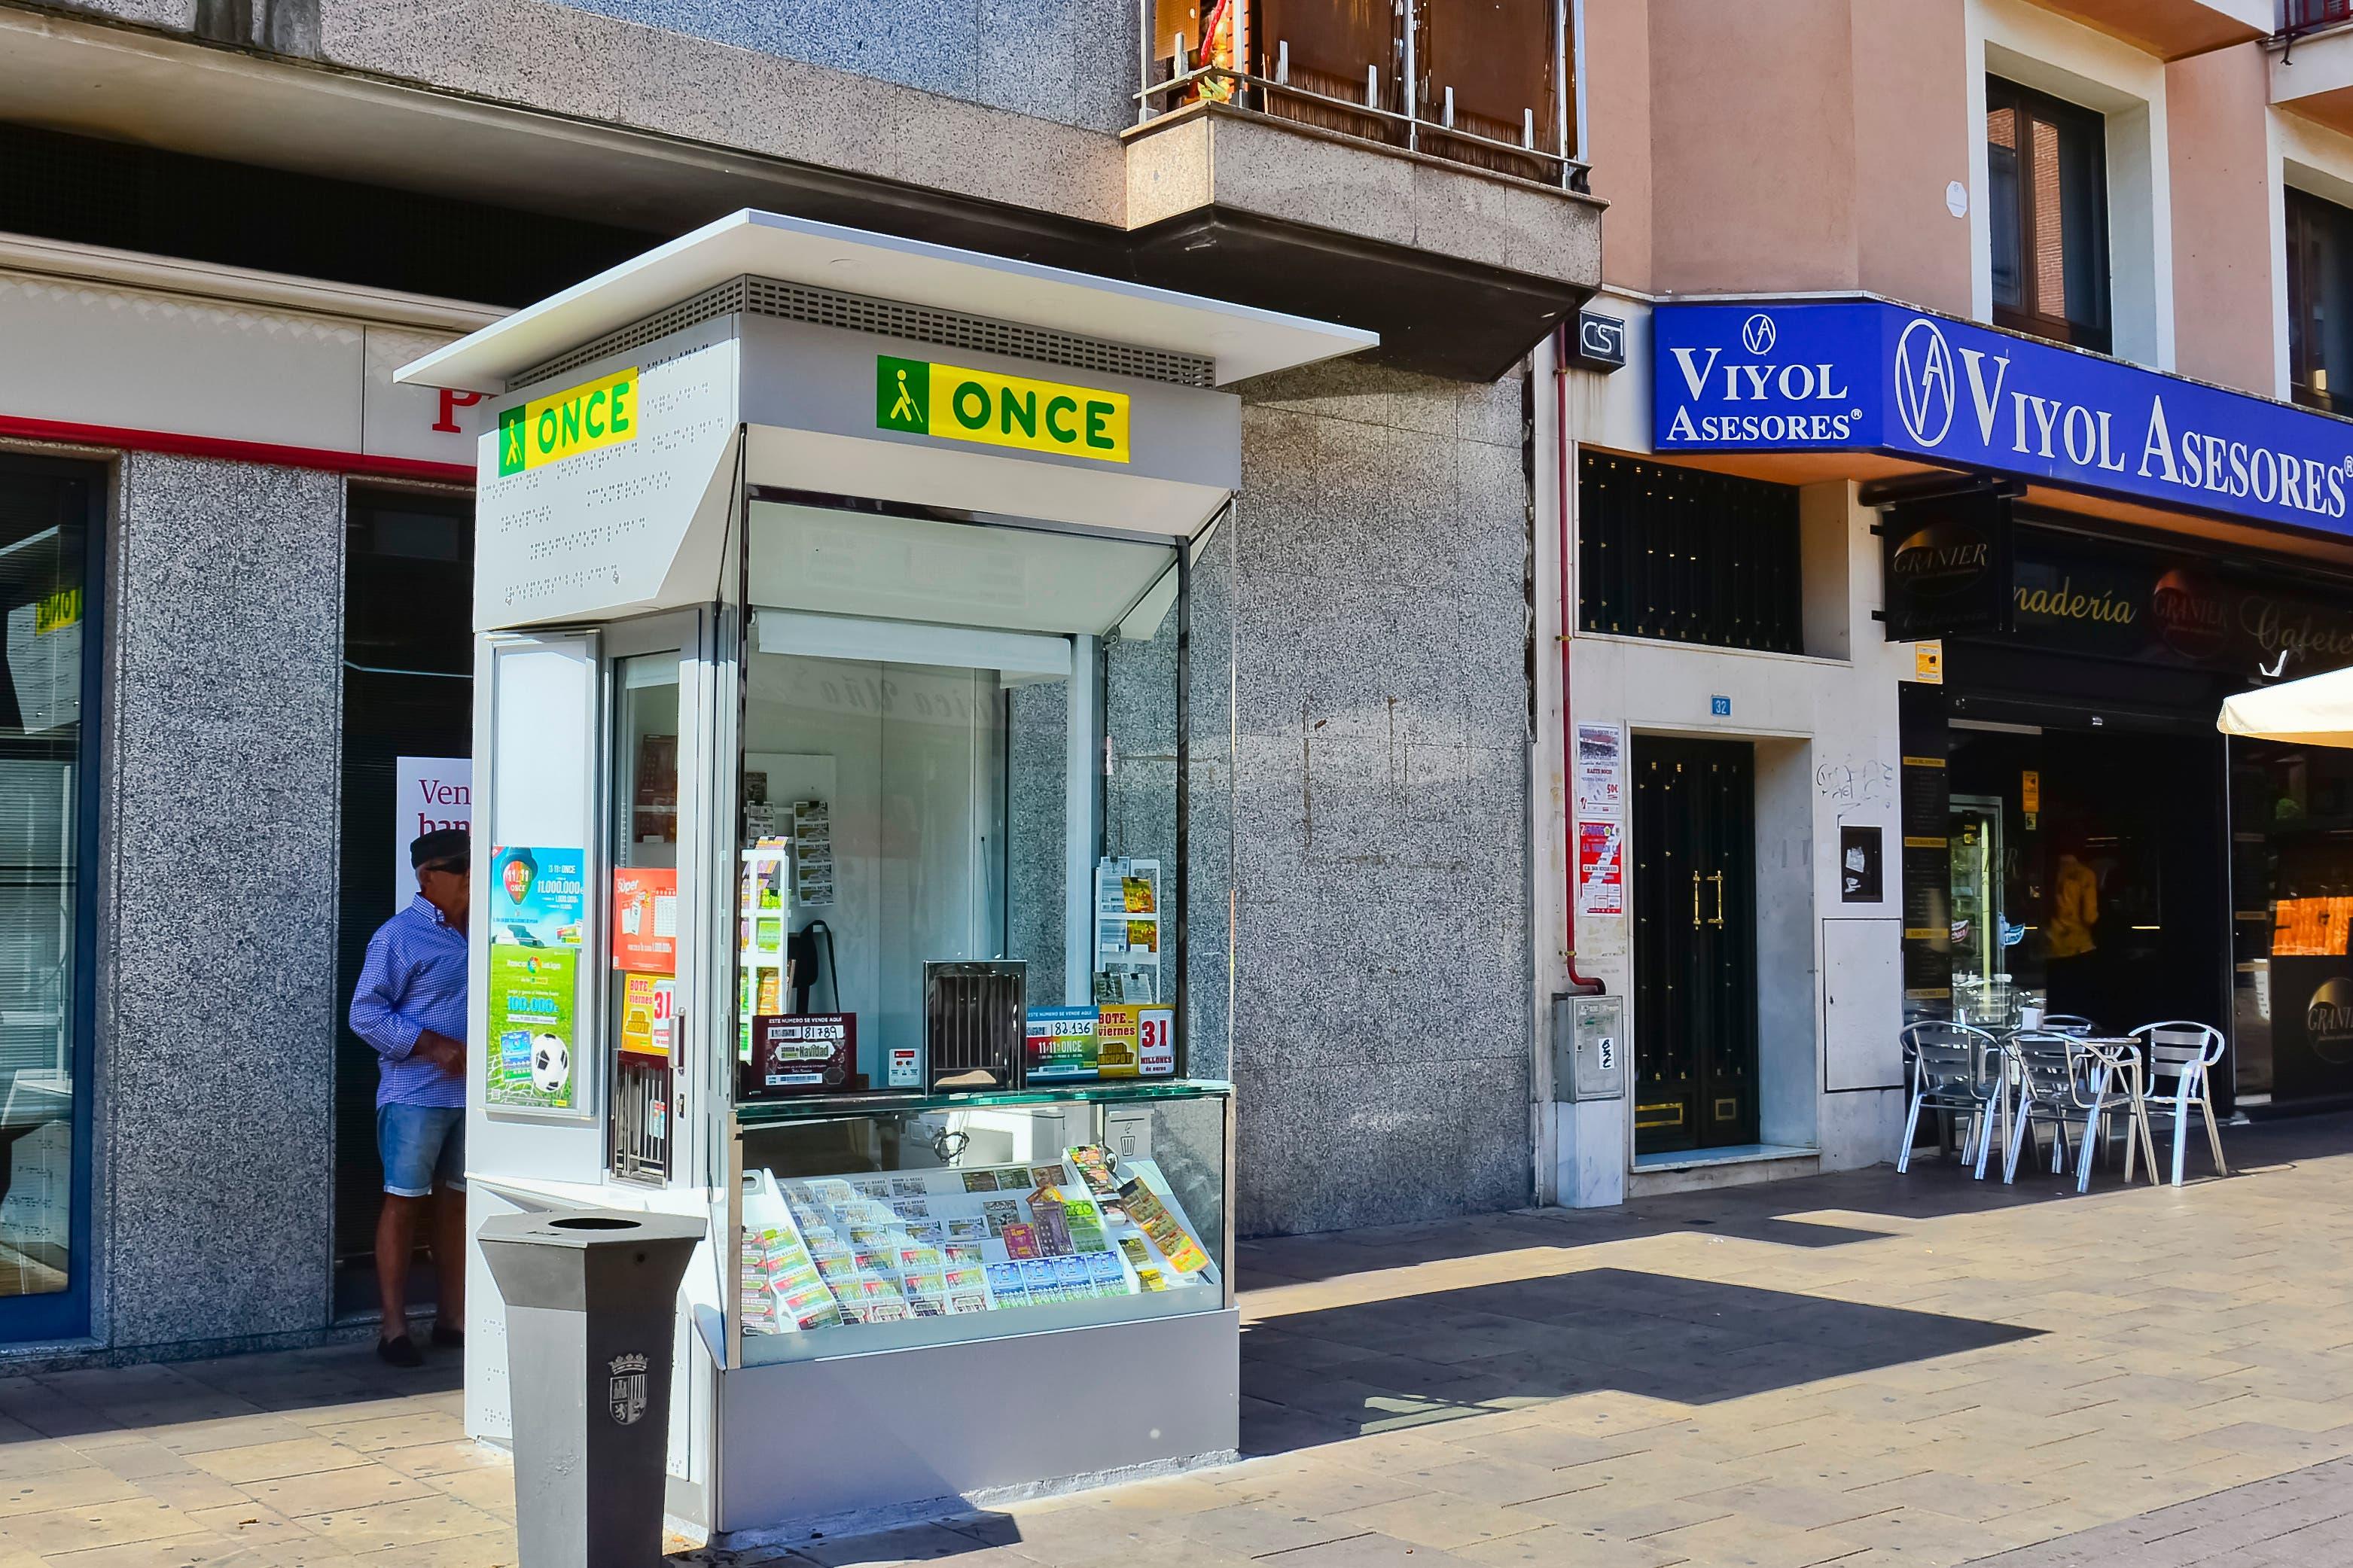 El nuevo kiosco de la ONCE (Ayto. Torrejón).